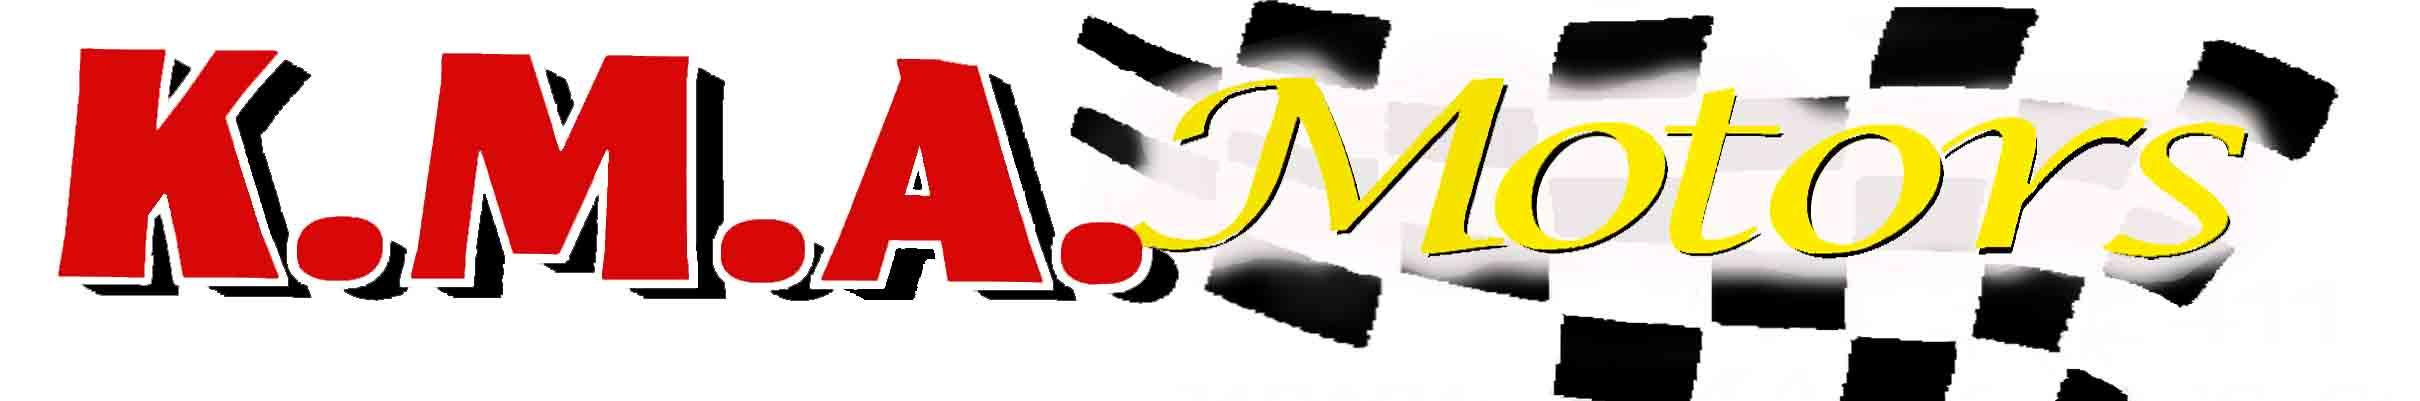 KMA Motors